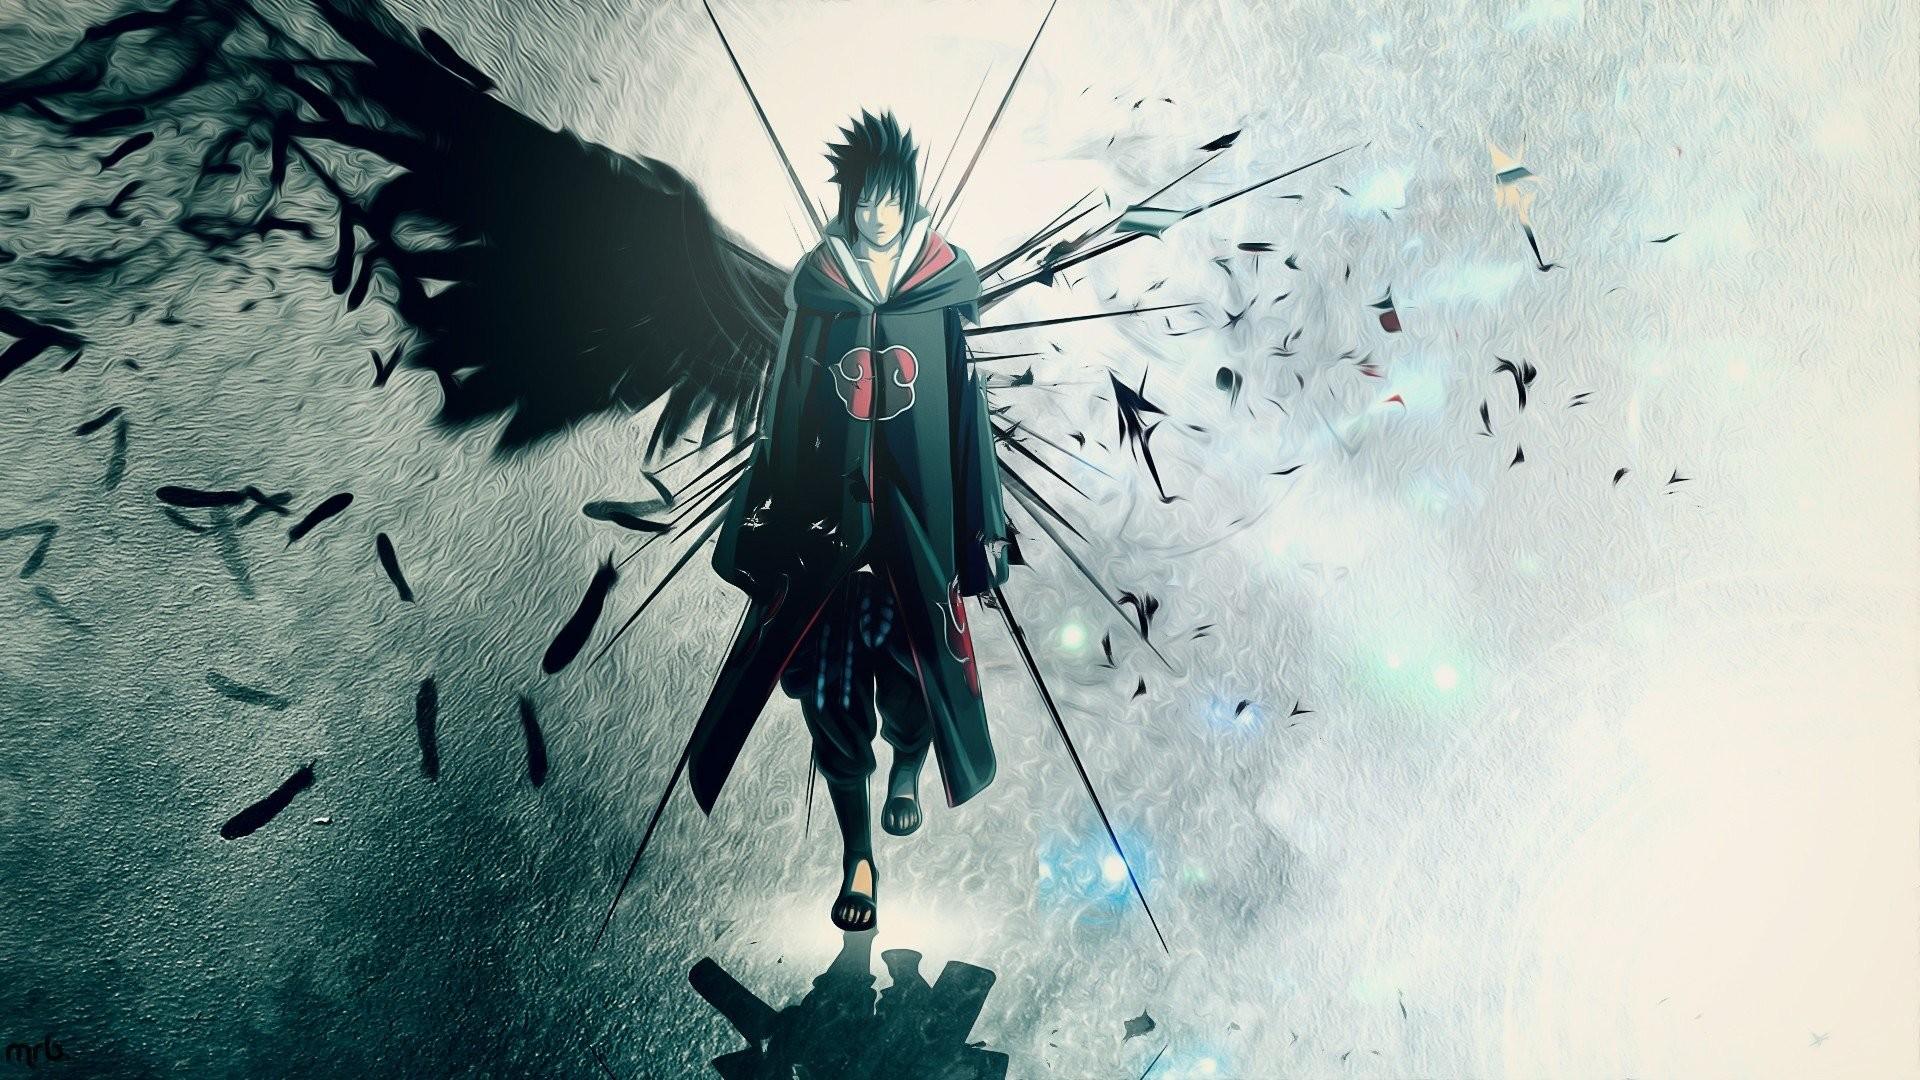 Res: 1920x1080, Wings Uchiha Sasuke Naruto: Shippuden Akatsuki feathers artwork anime anime  boys wallpaper |  | 280467 | WallpaperUP